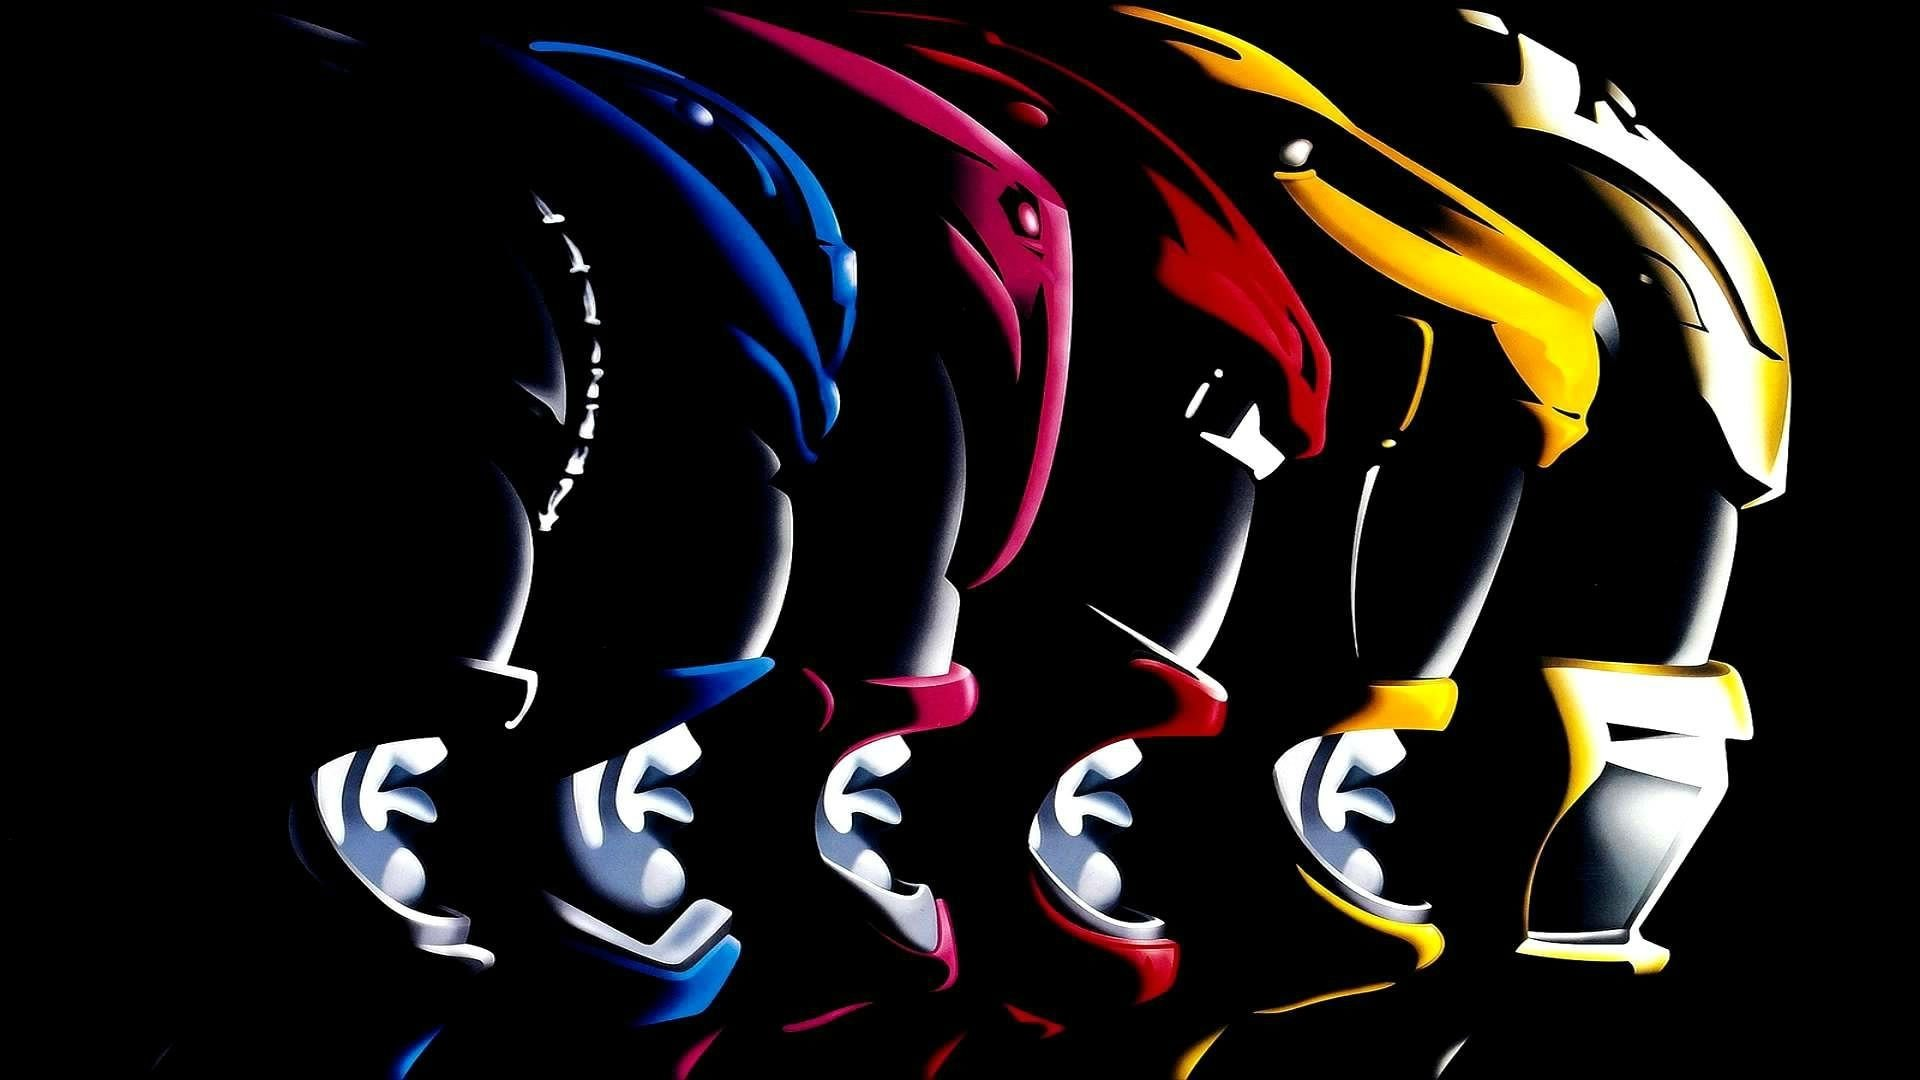 Power Rangers Hd Wallpaper Background Image 1920x1080 Id